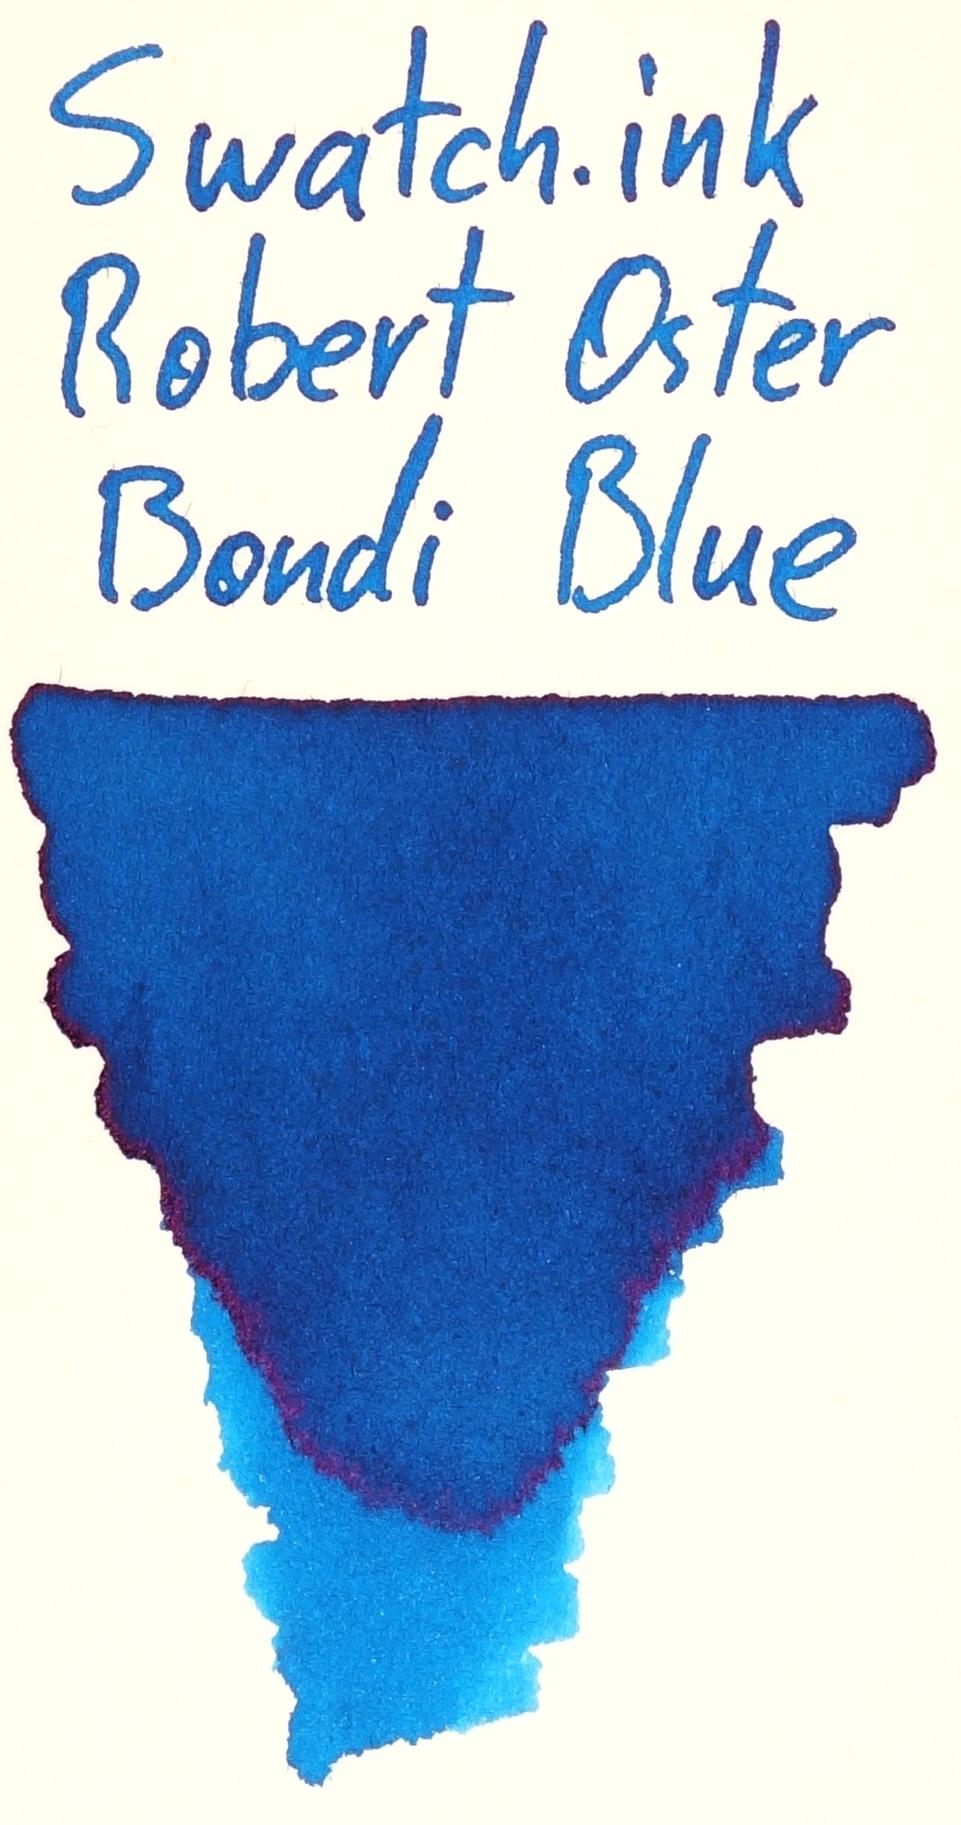 Robert Oster Bondi Blue Swatch.ink.JPG